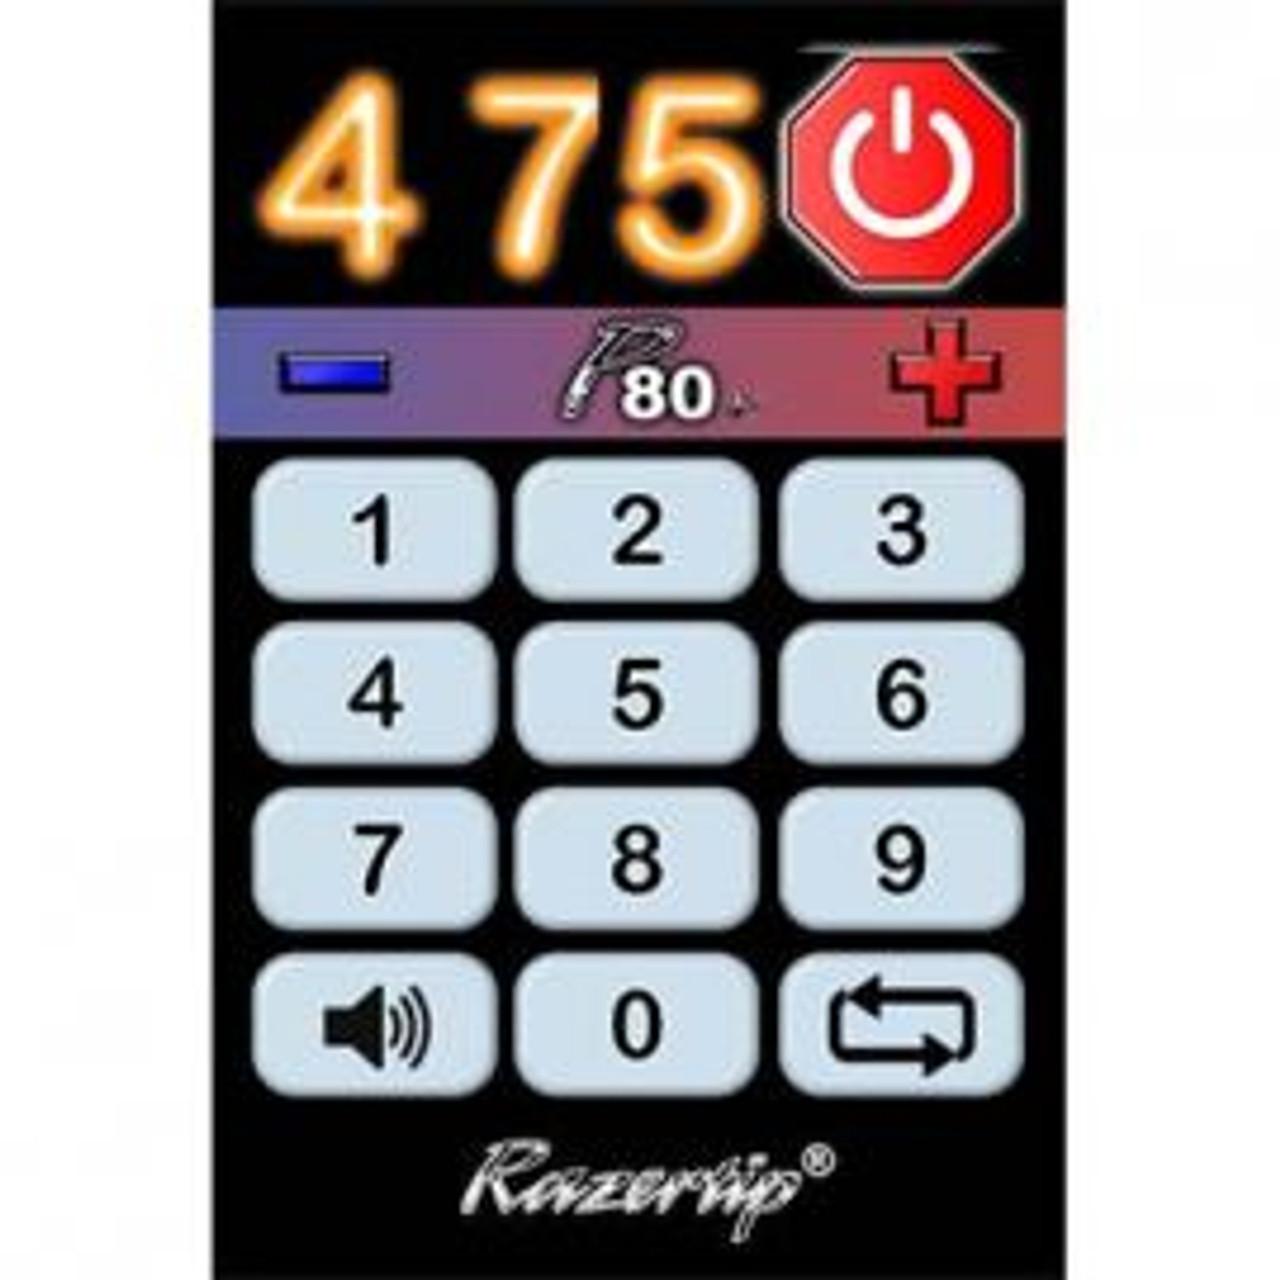 Keypad of the Razertip Pyrography P80X Expansion Module